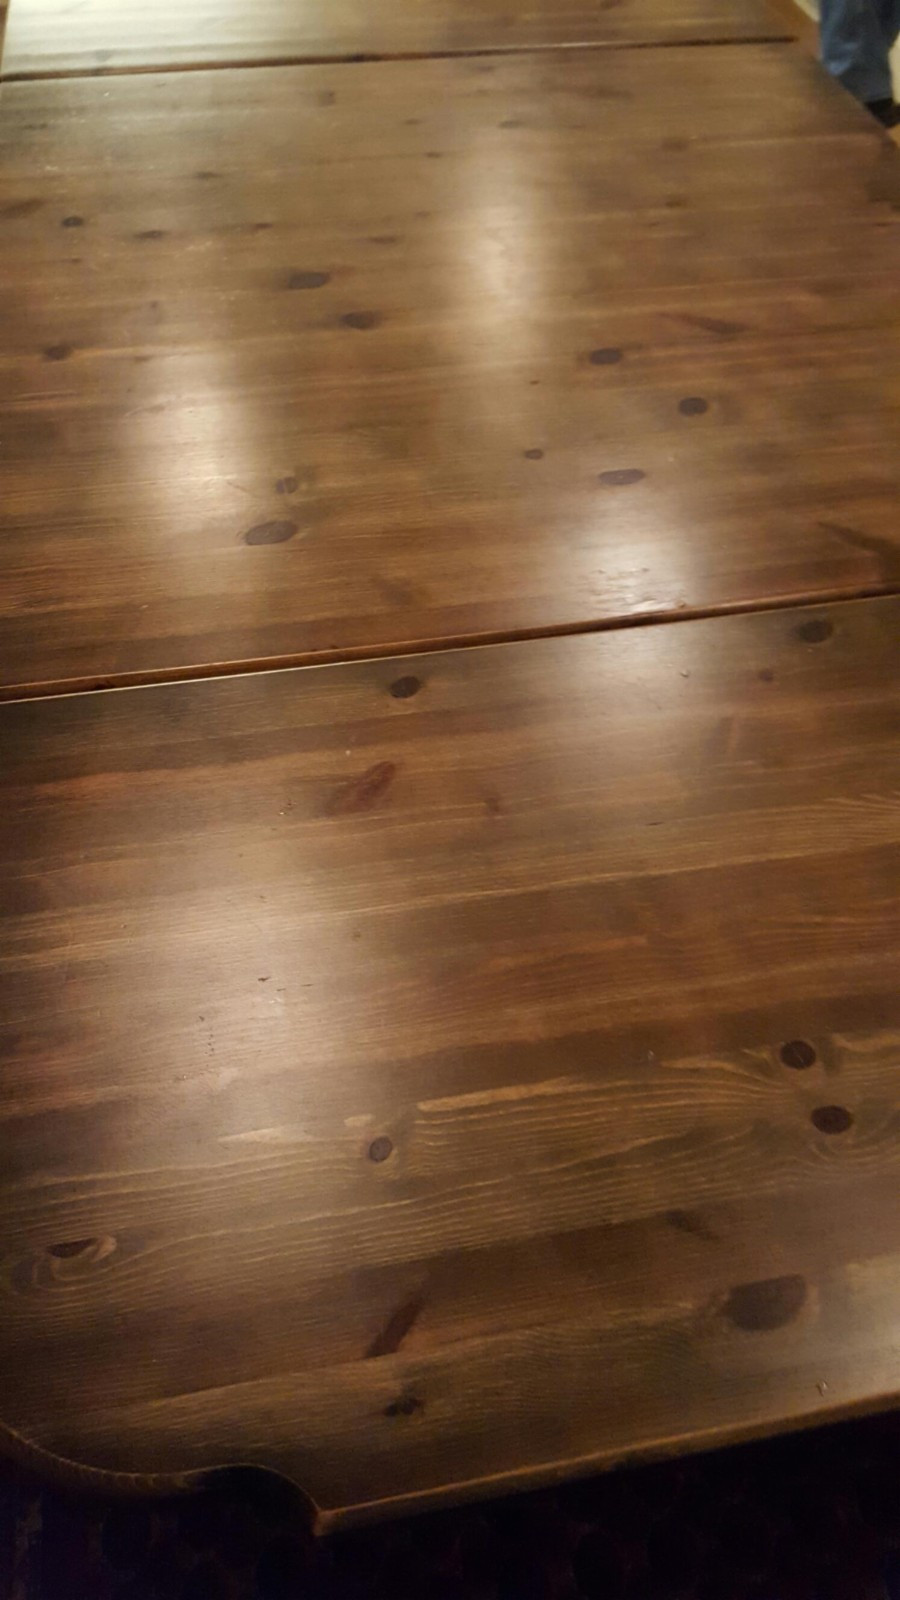 Spisebord fra Kvande & Nordvik - Brårud  - Kraftig spisebord fra Kvande og Nordvik med 2 klaffer. 200cm x 100cm med klaffer. Uten klaffer 100cm x 100cm. Fin skuff under bordplaten. - Brårud